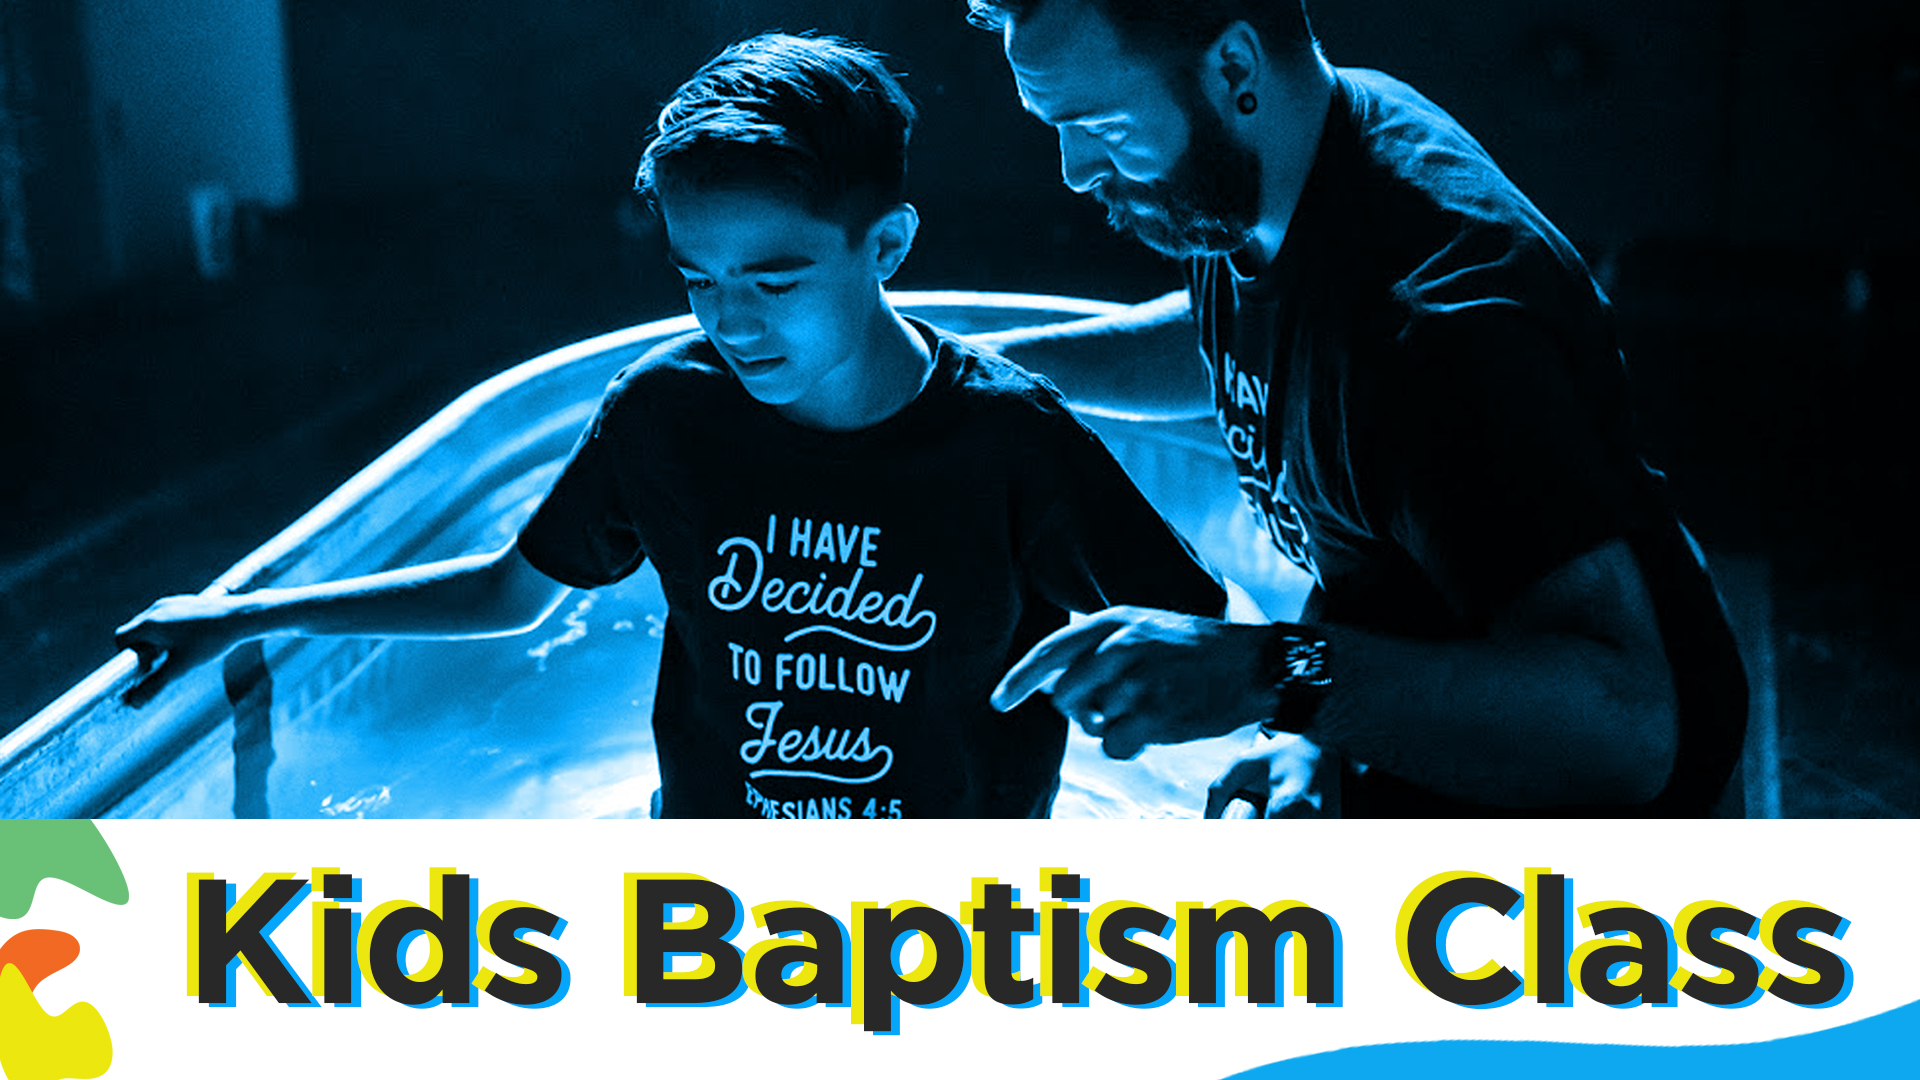 Image: Kid's Baptism Class